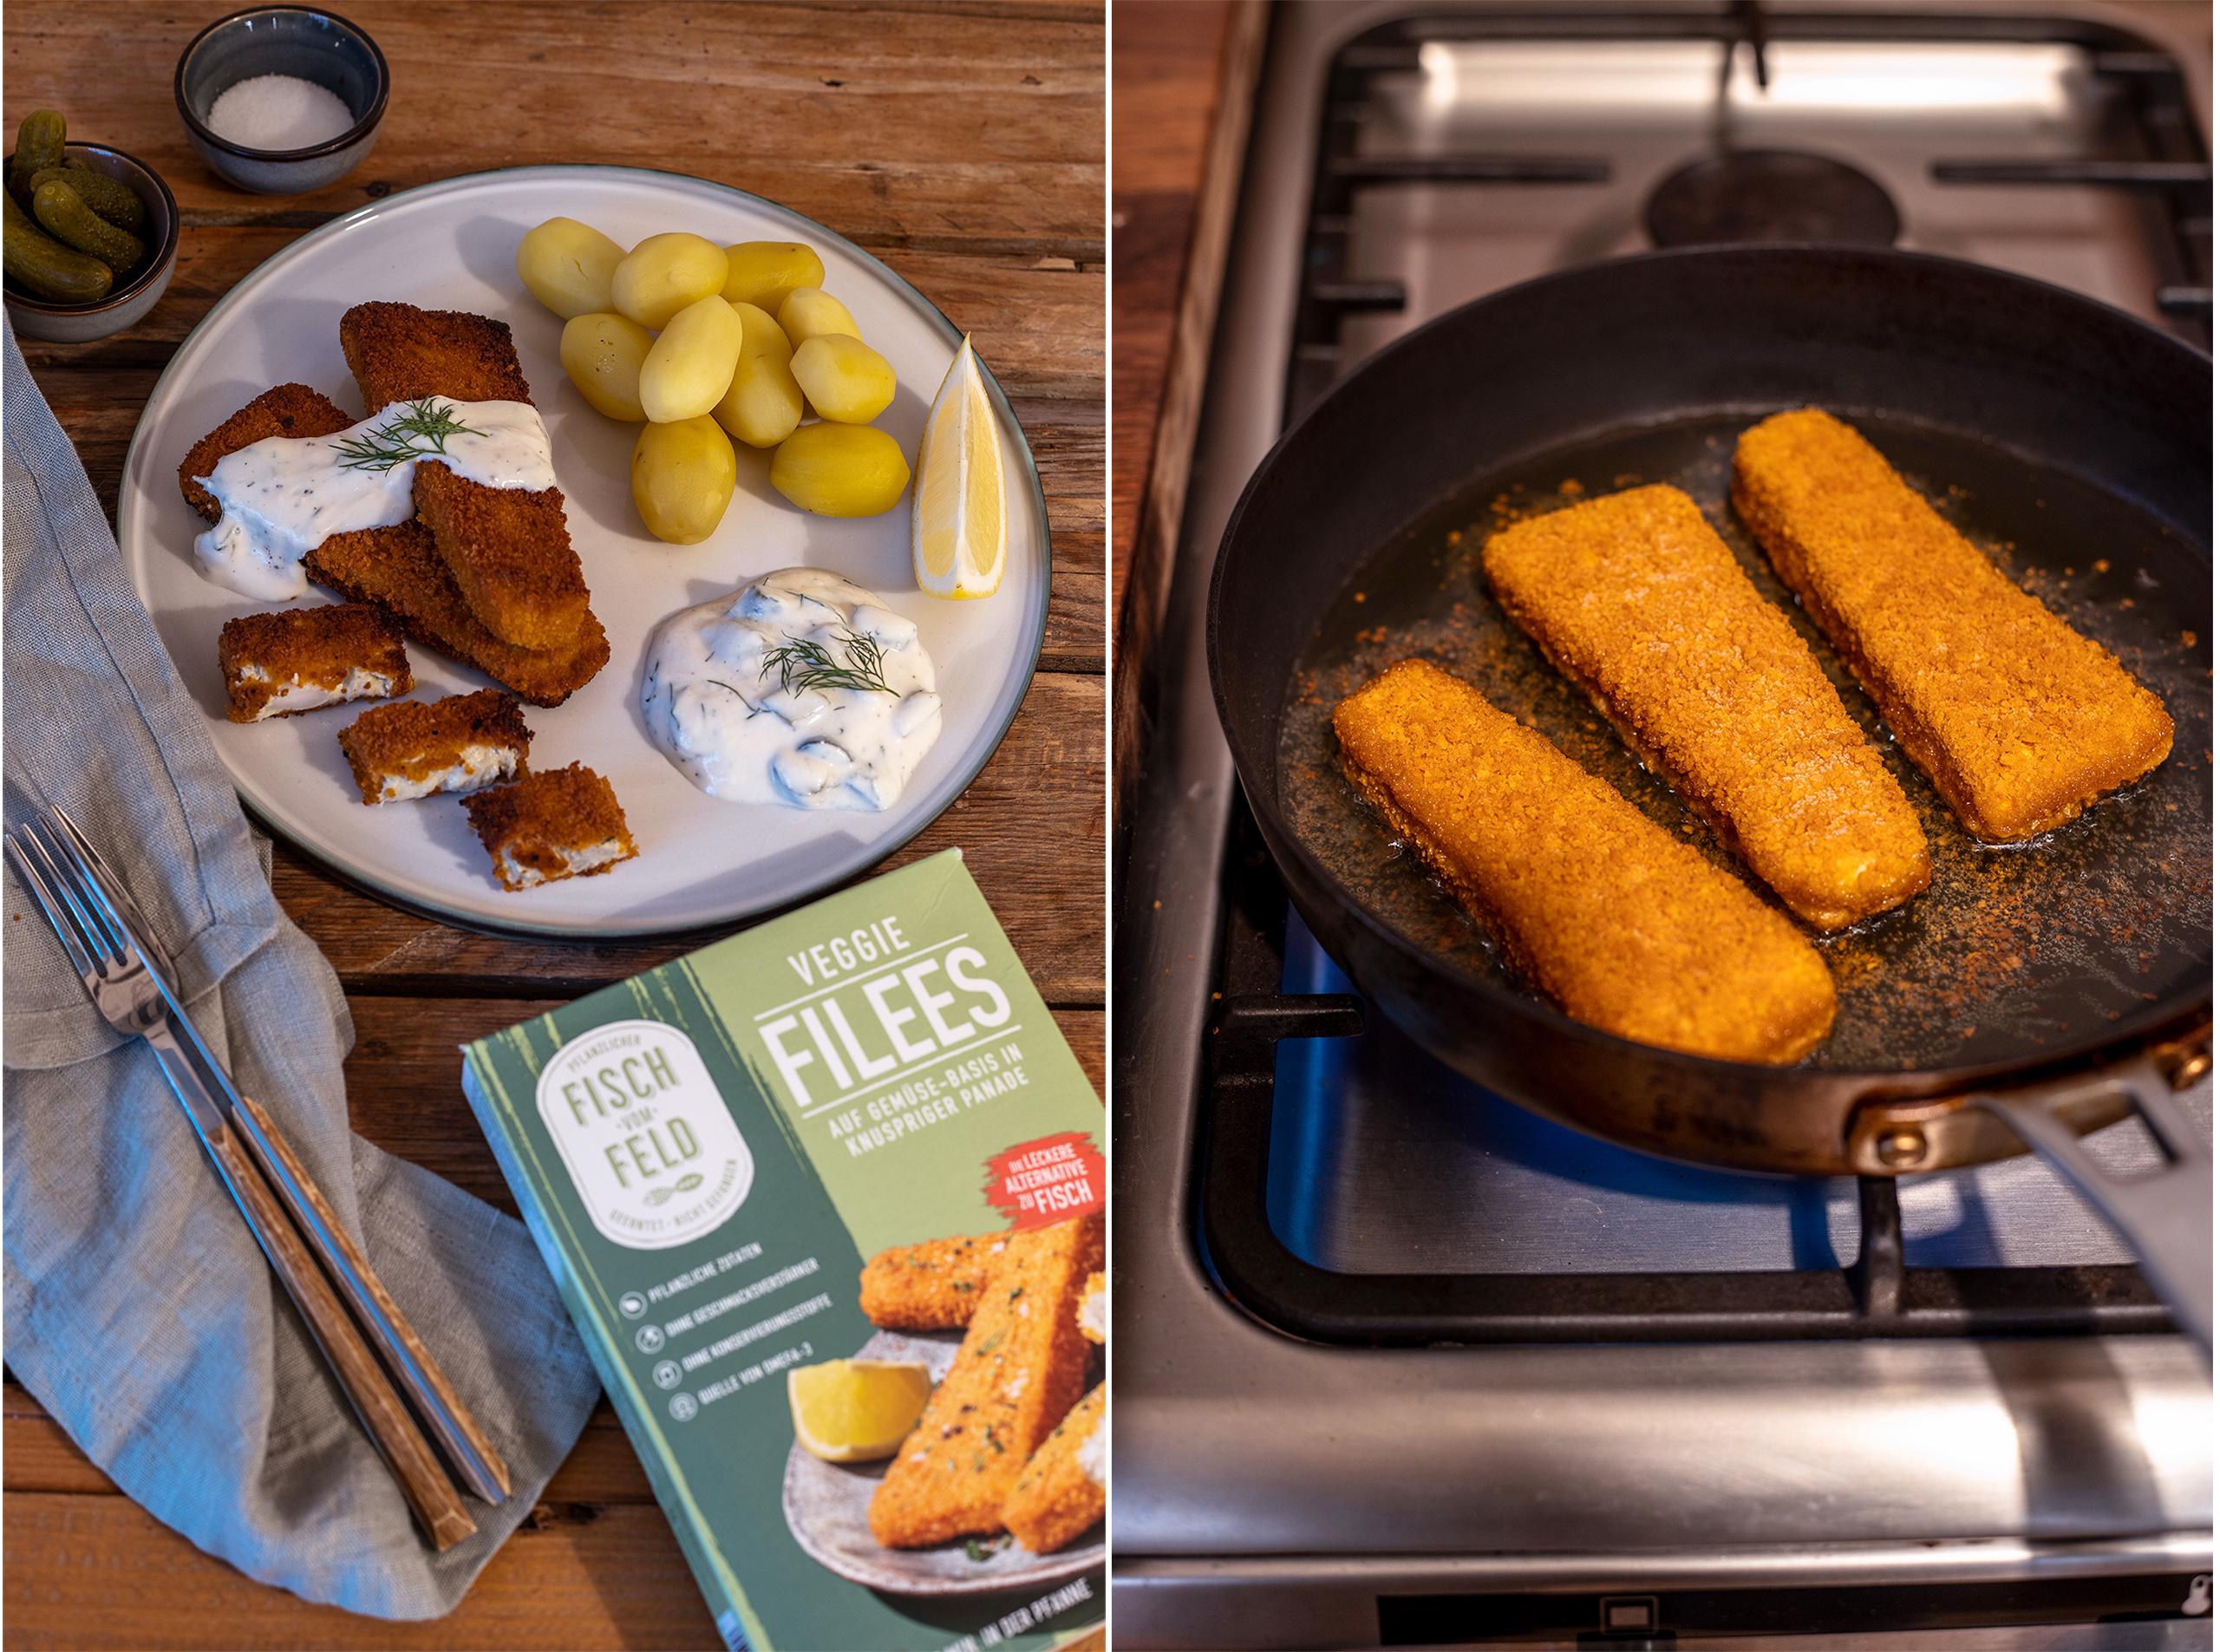 Fischfilet vegan rezept